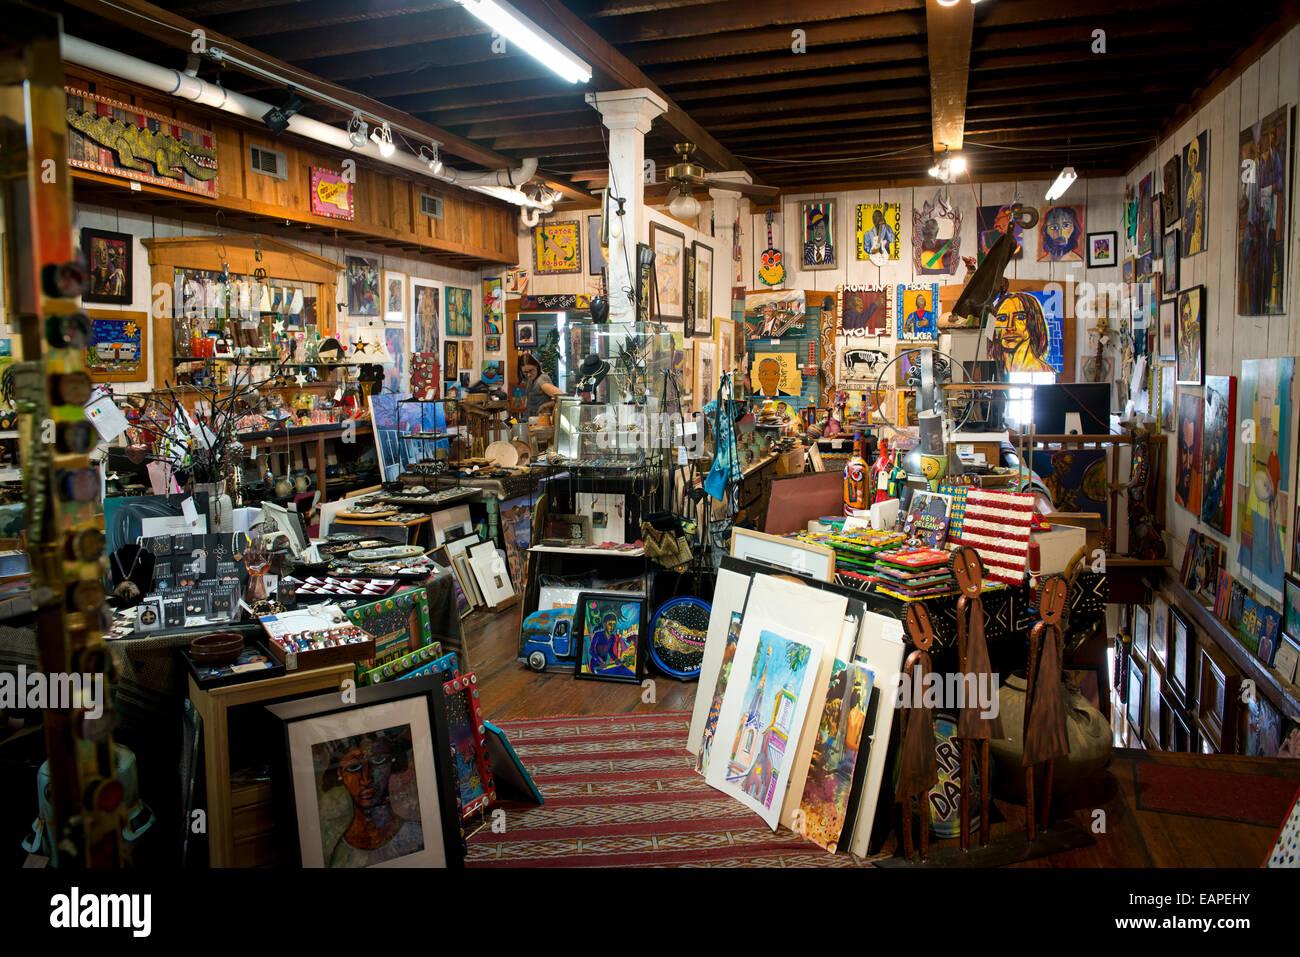 Interior de la Buhardilla Galería. Vicksburg Mississippi Imagen De Stock